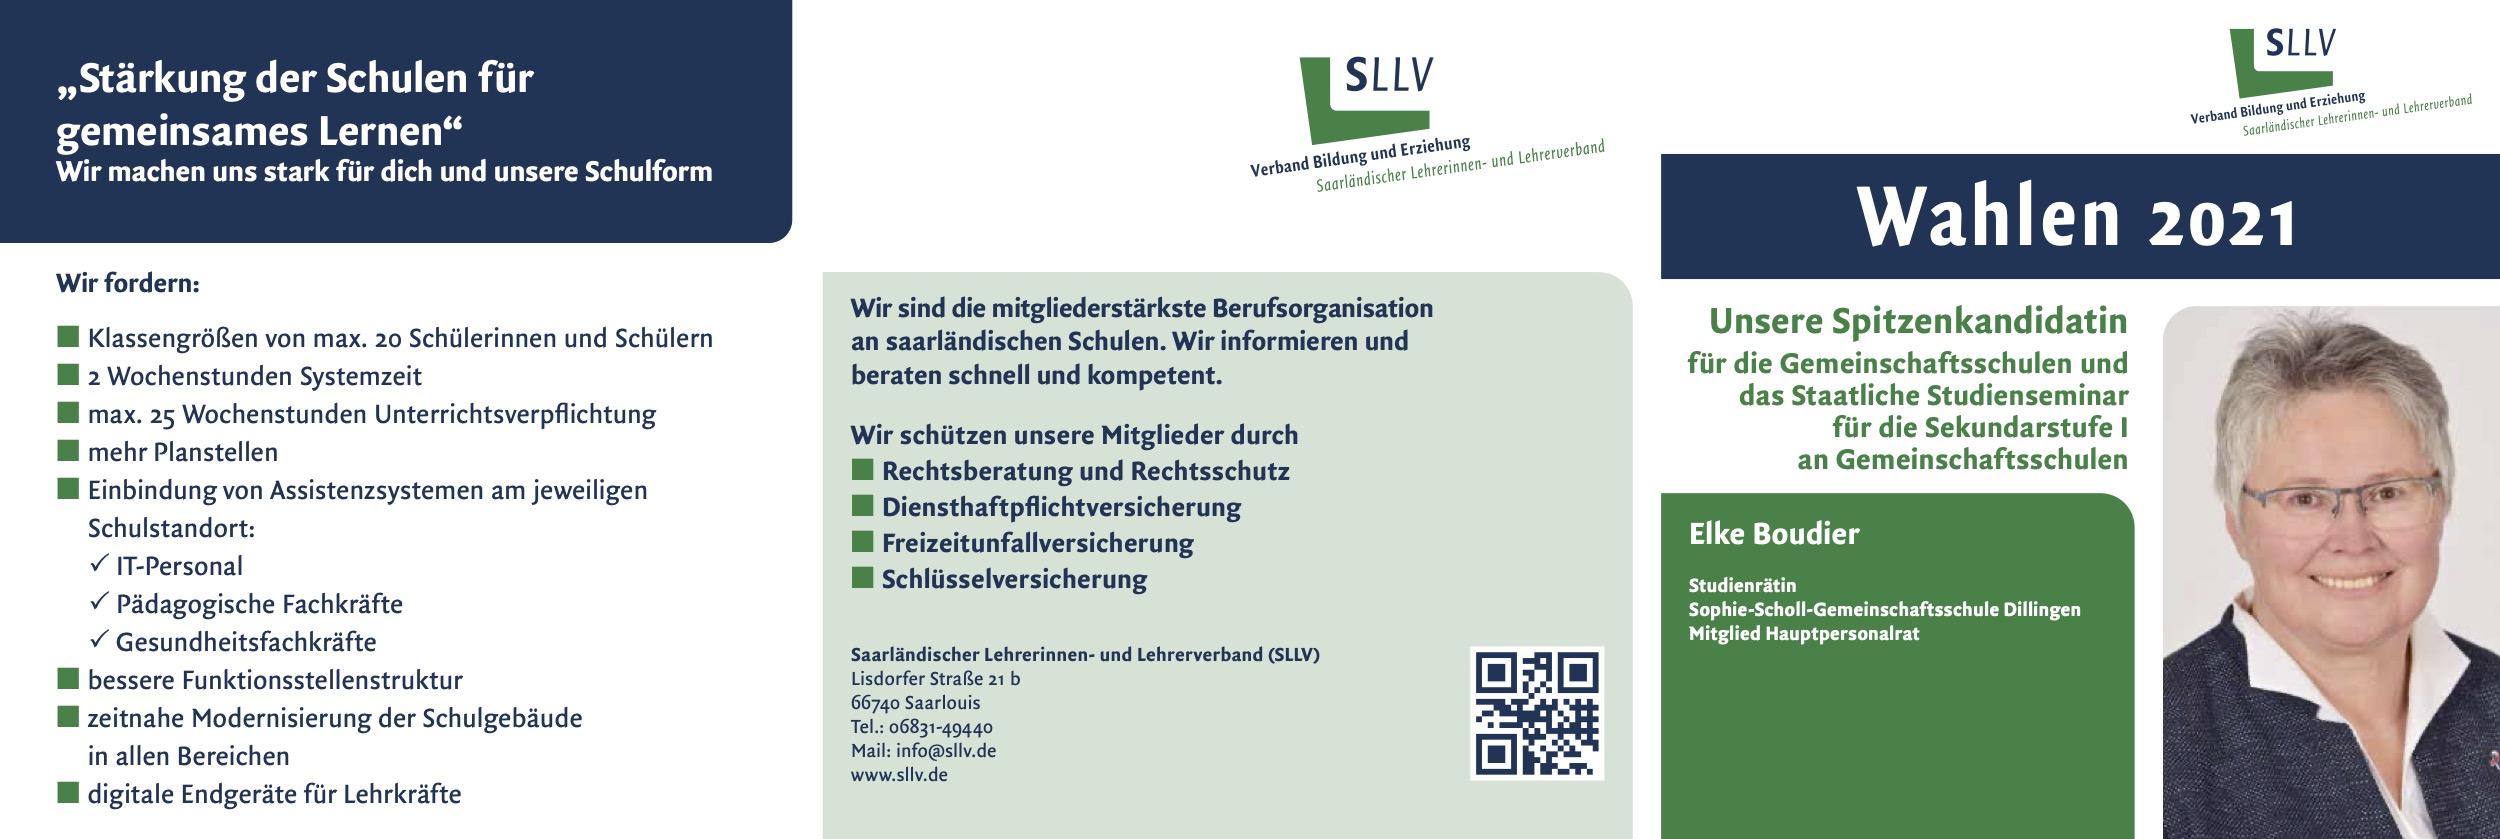 sllv_fly_PRwahlen_gems_2021_01